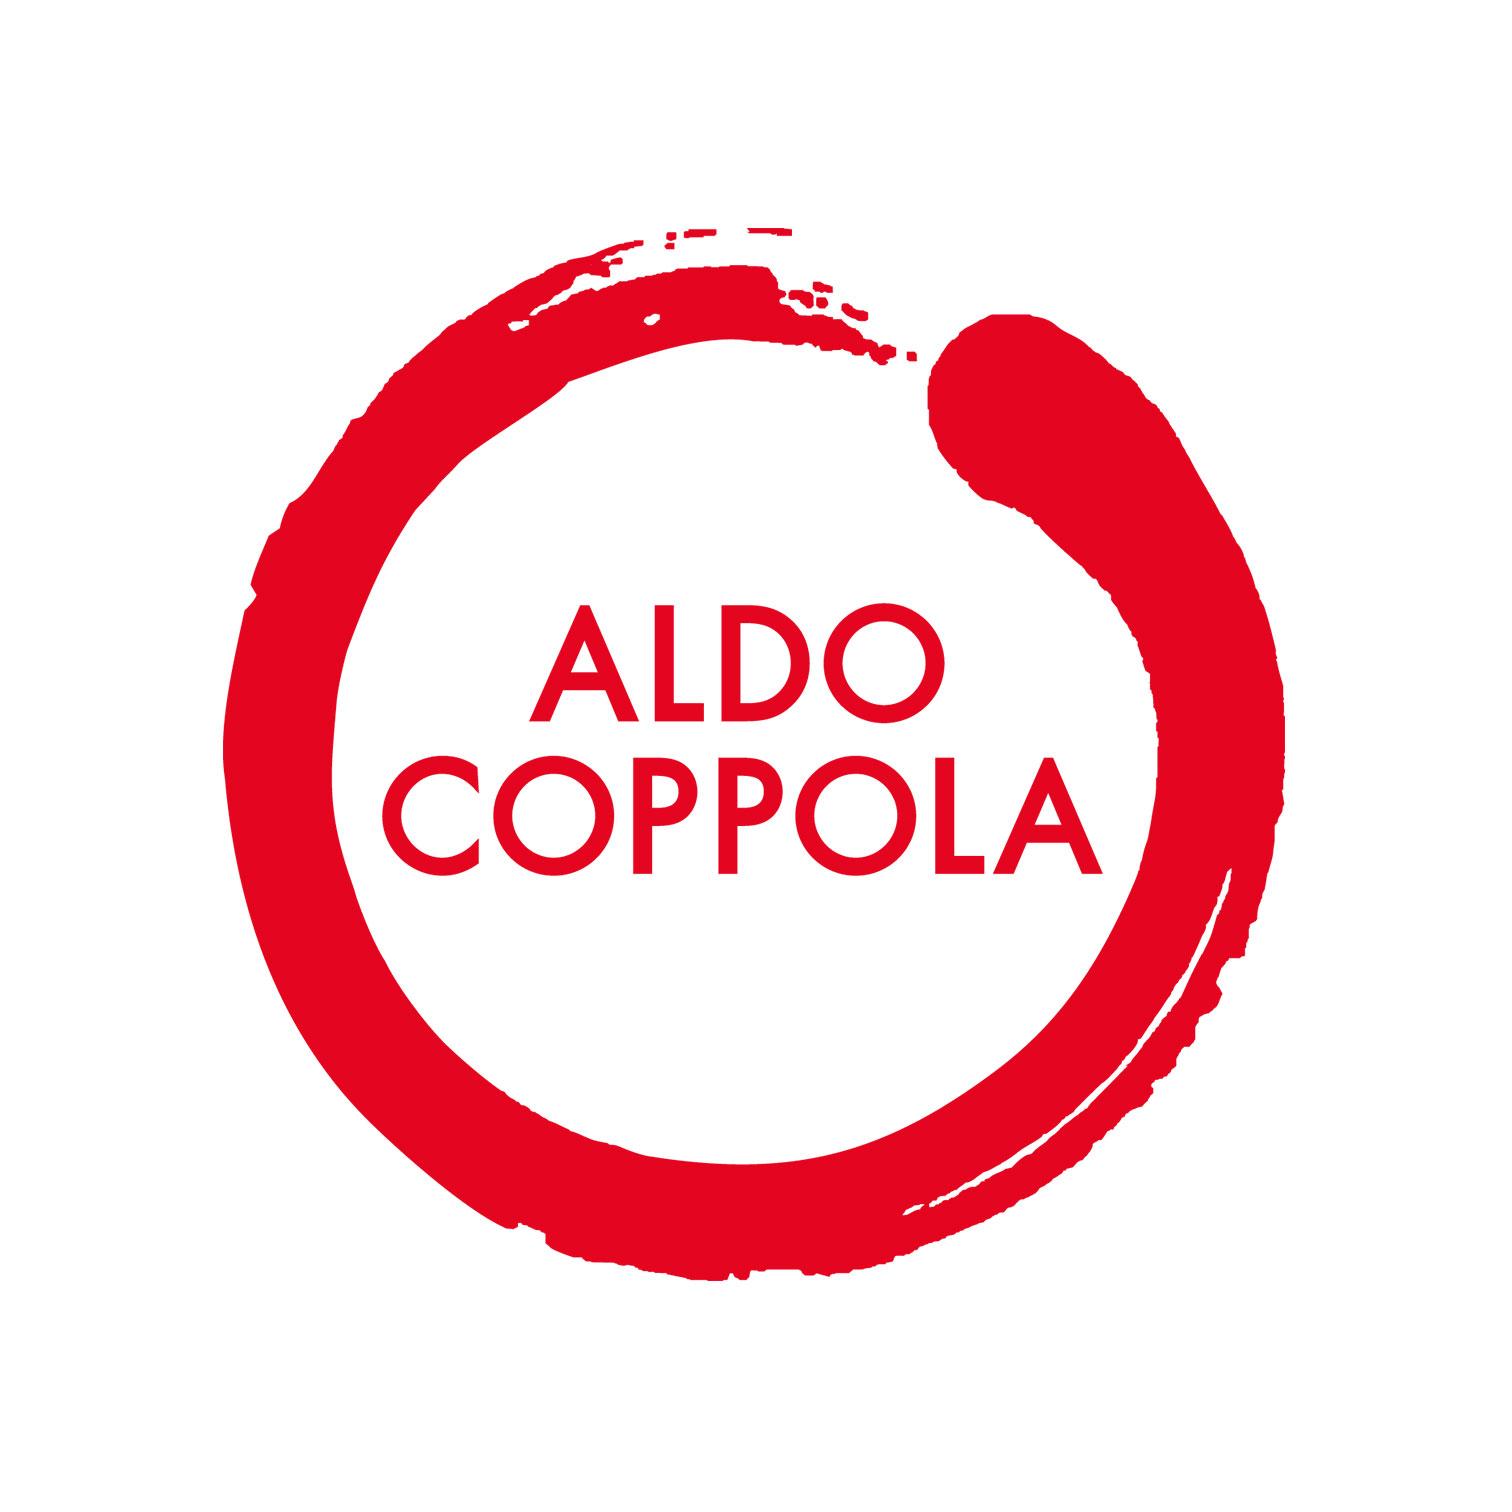 aldo-coppola